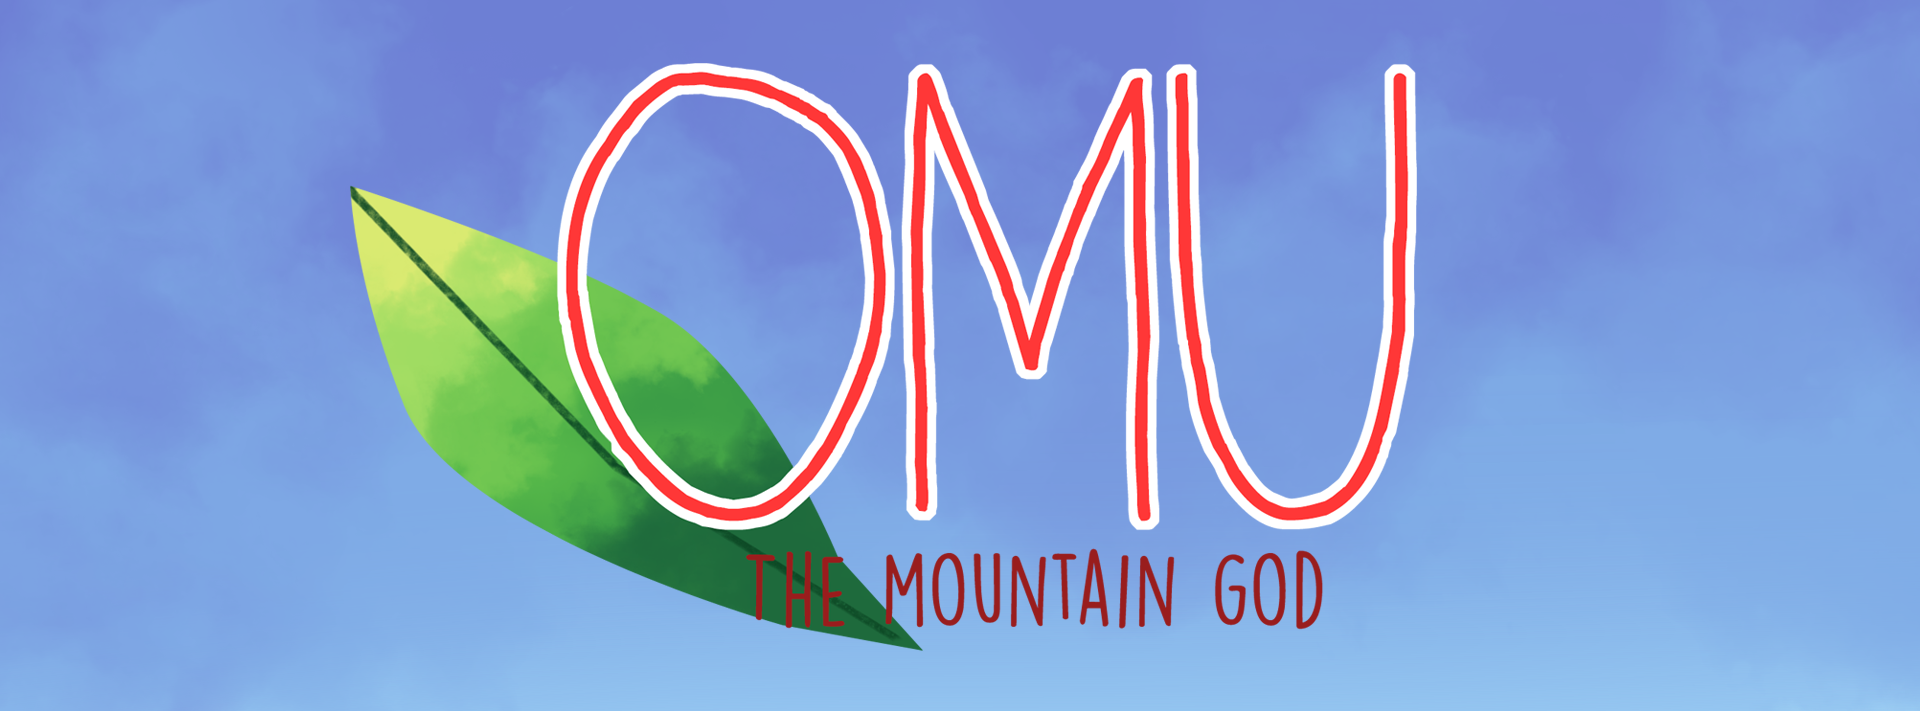 Omu the Mountain God